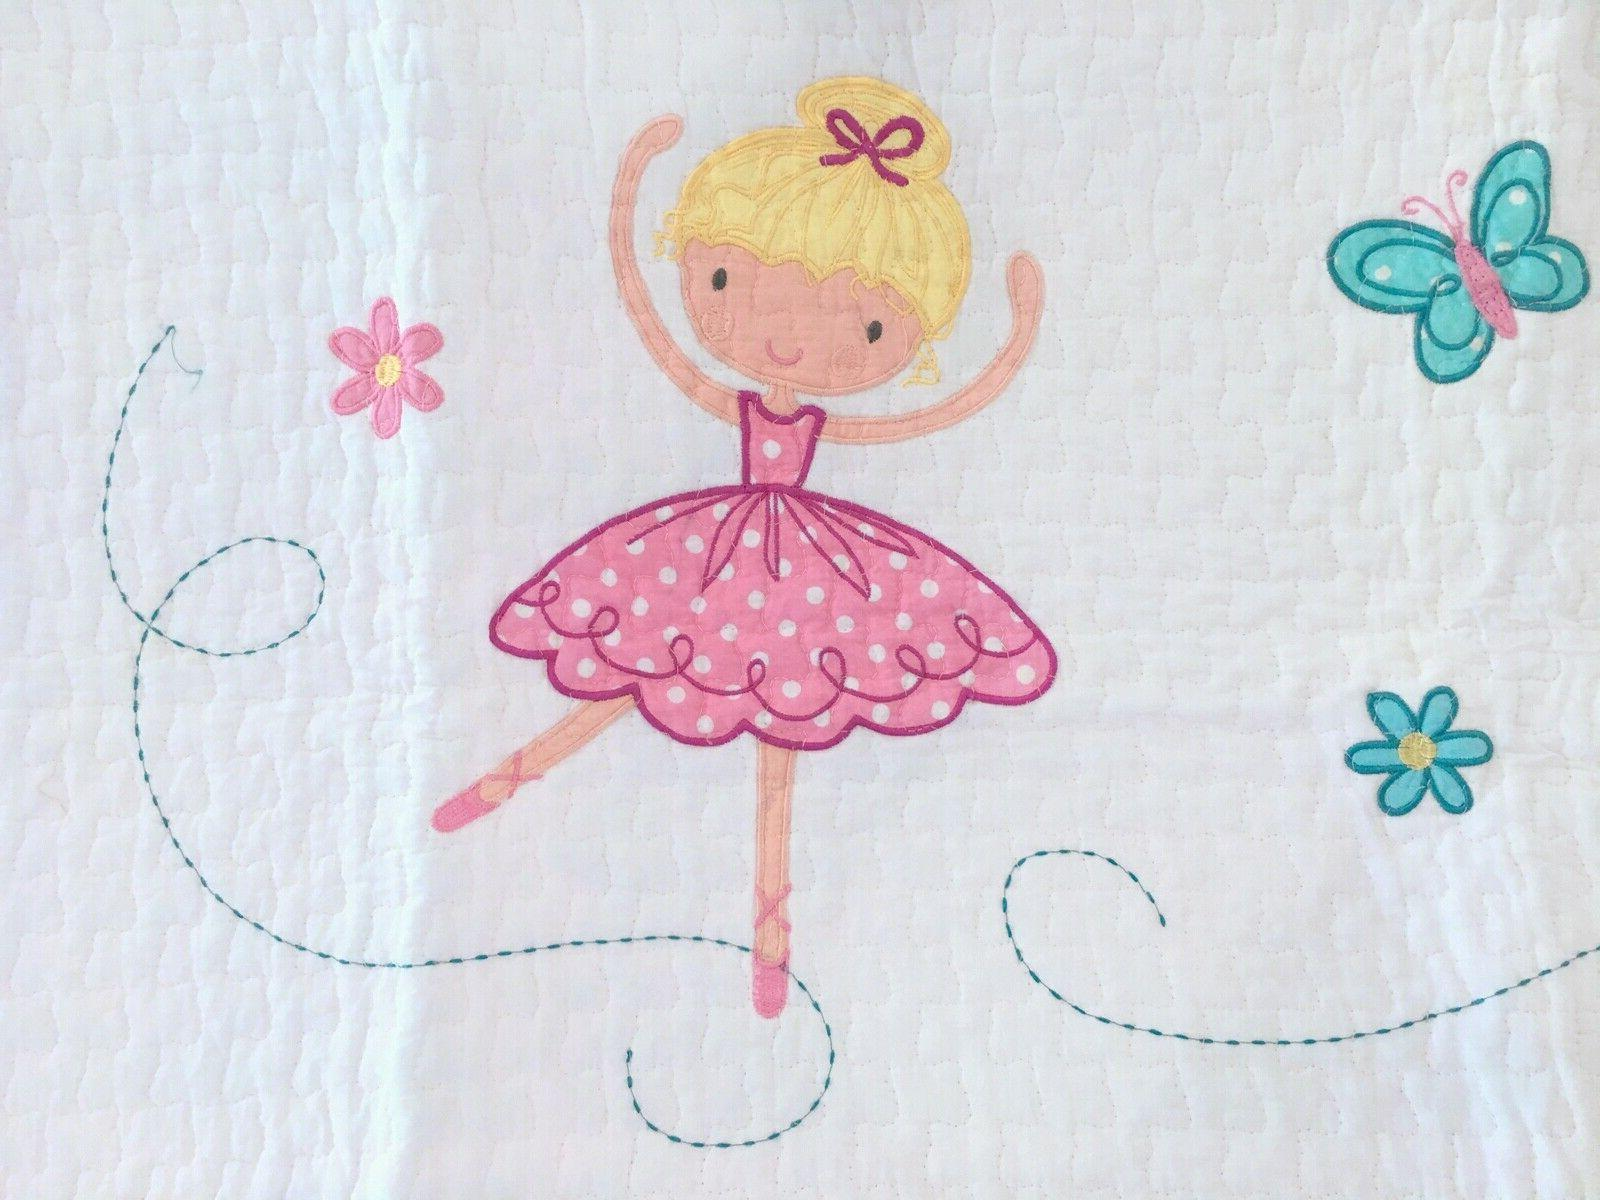 Ballerina Girls Reversible Cotton Quilt Set, Bedspreads,